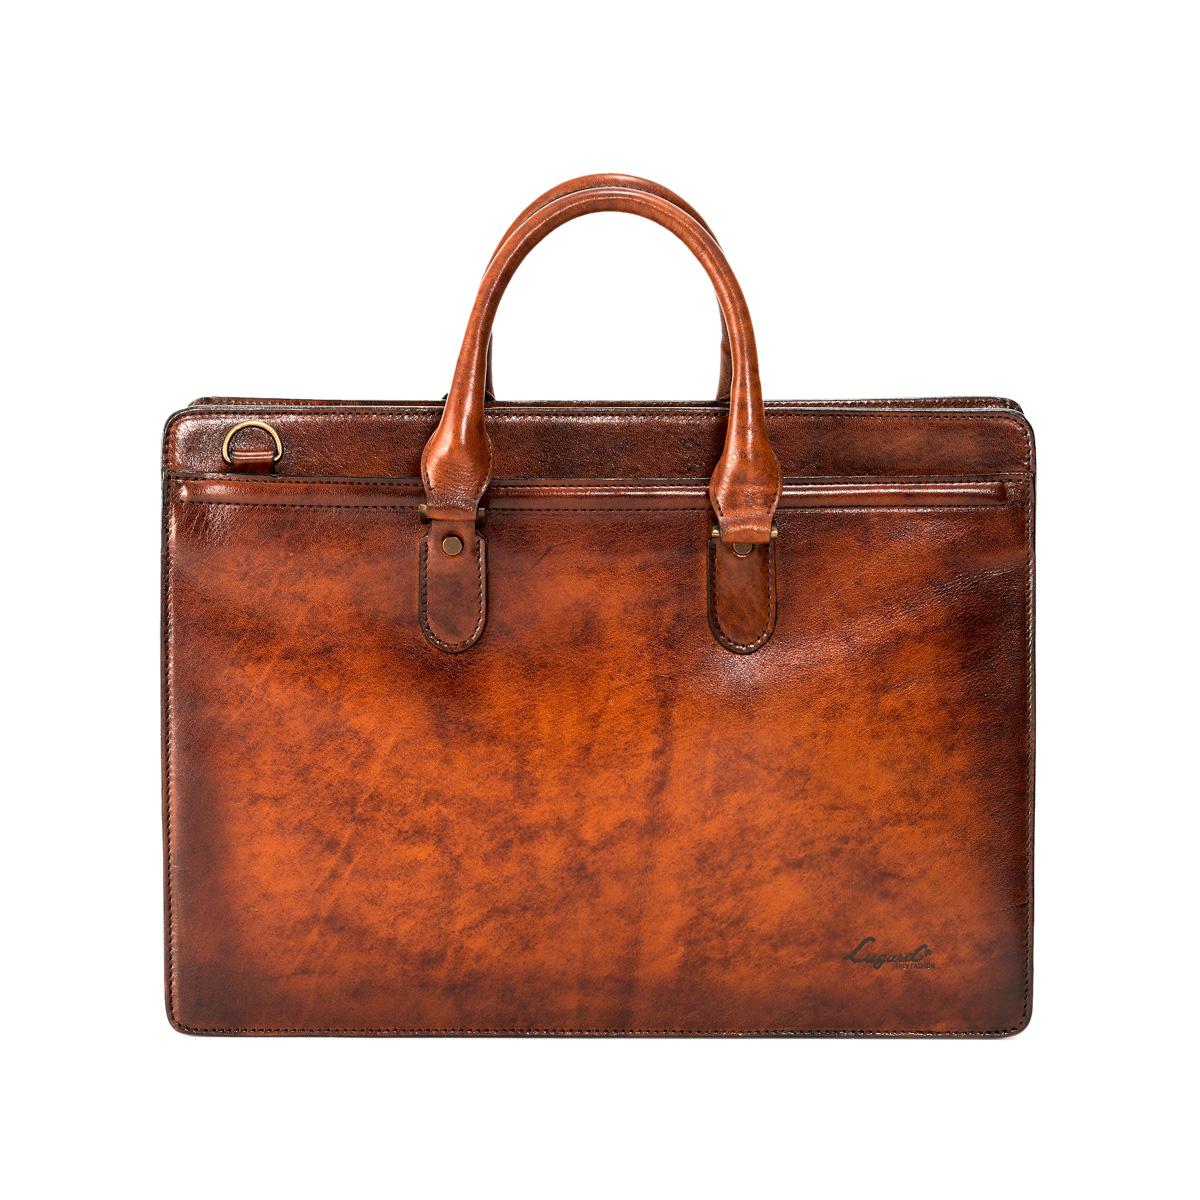 Lugard G3 BUSINESS BAG ラガード 青木鞄 ジースリー バッグ ビジネスバッグ メンズ ラウンド ネイビー ブラウン ボルドー 5228